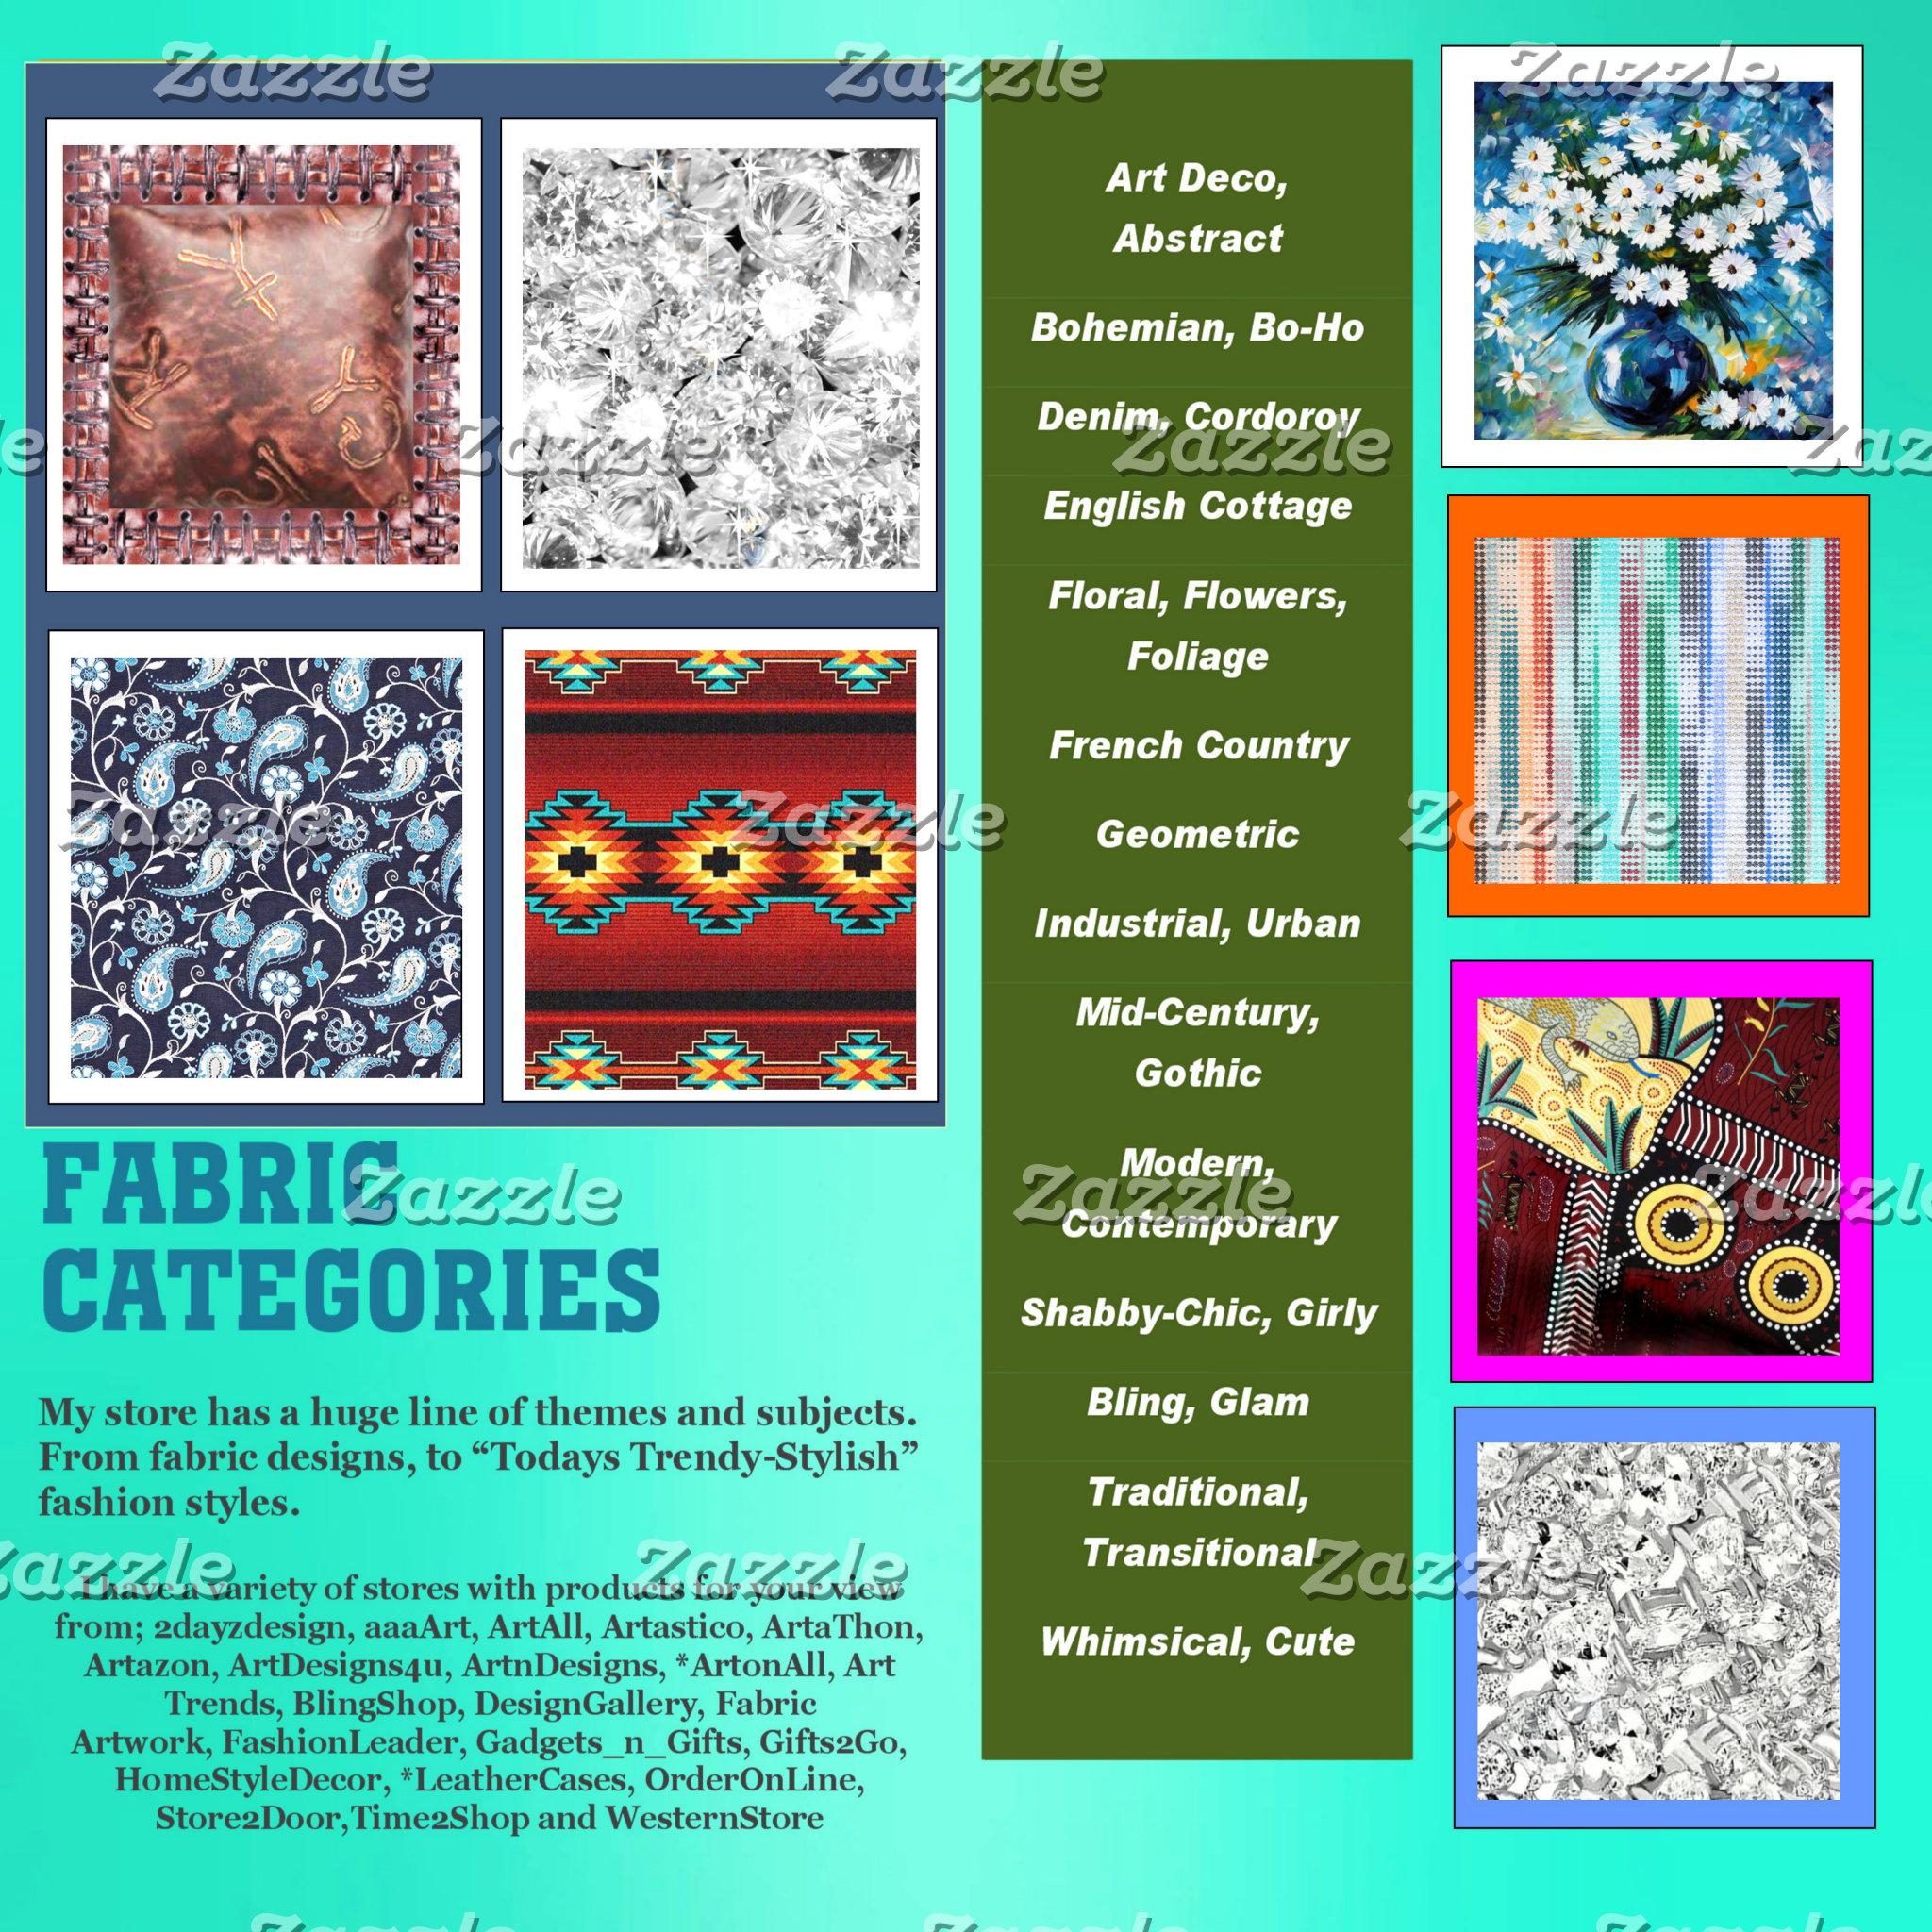 FABRIC, Categories